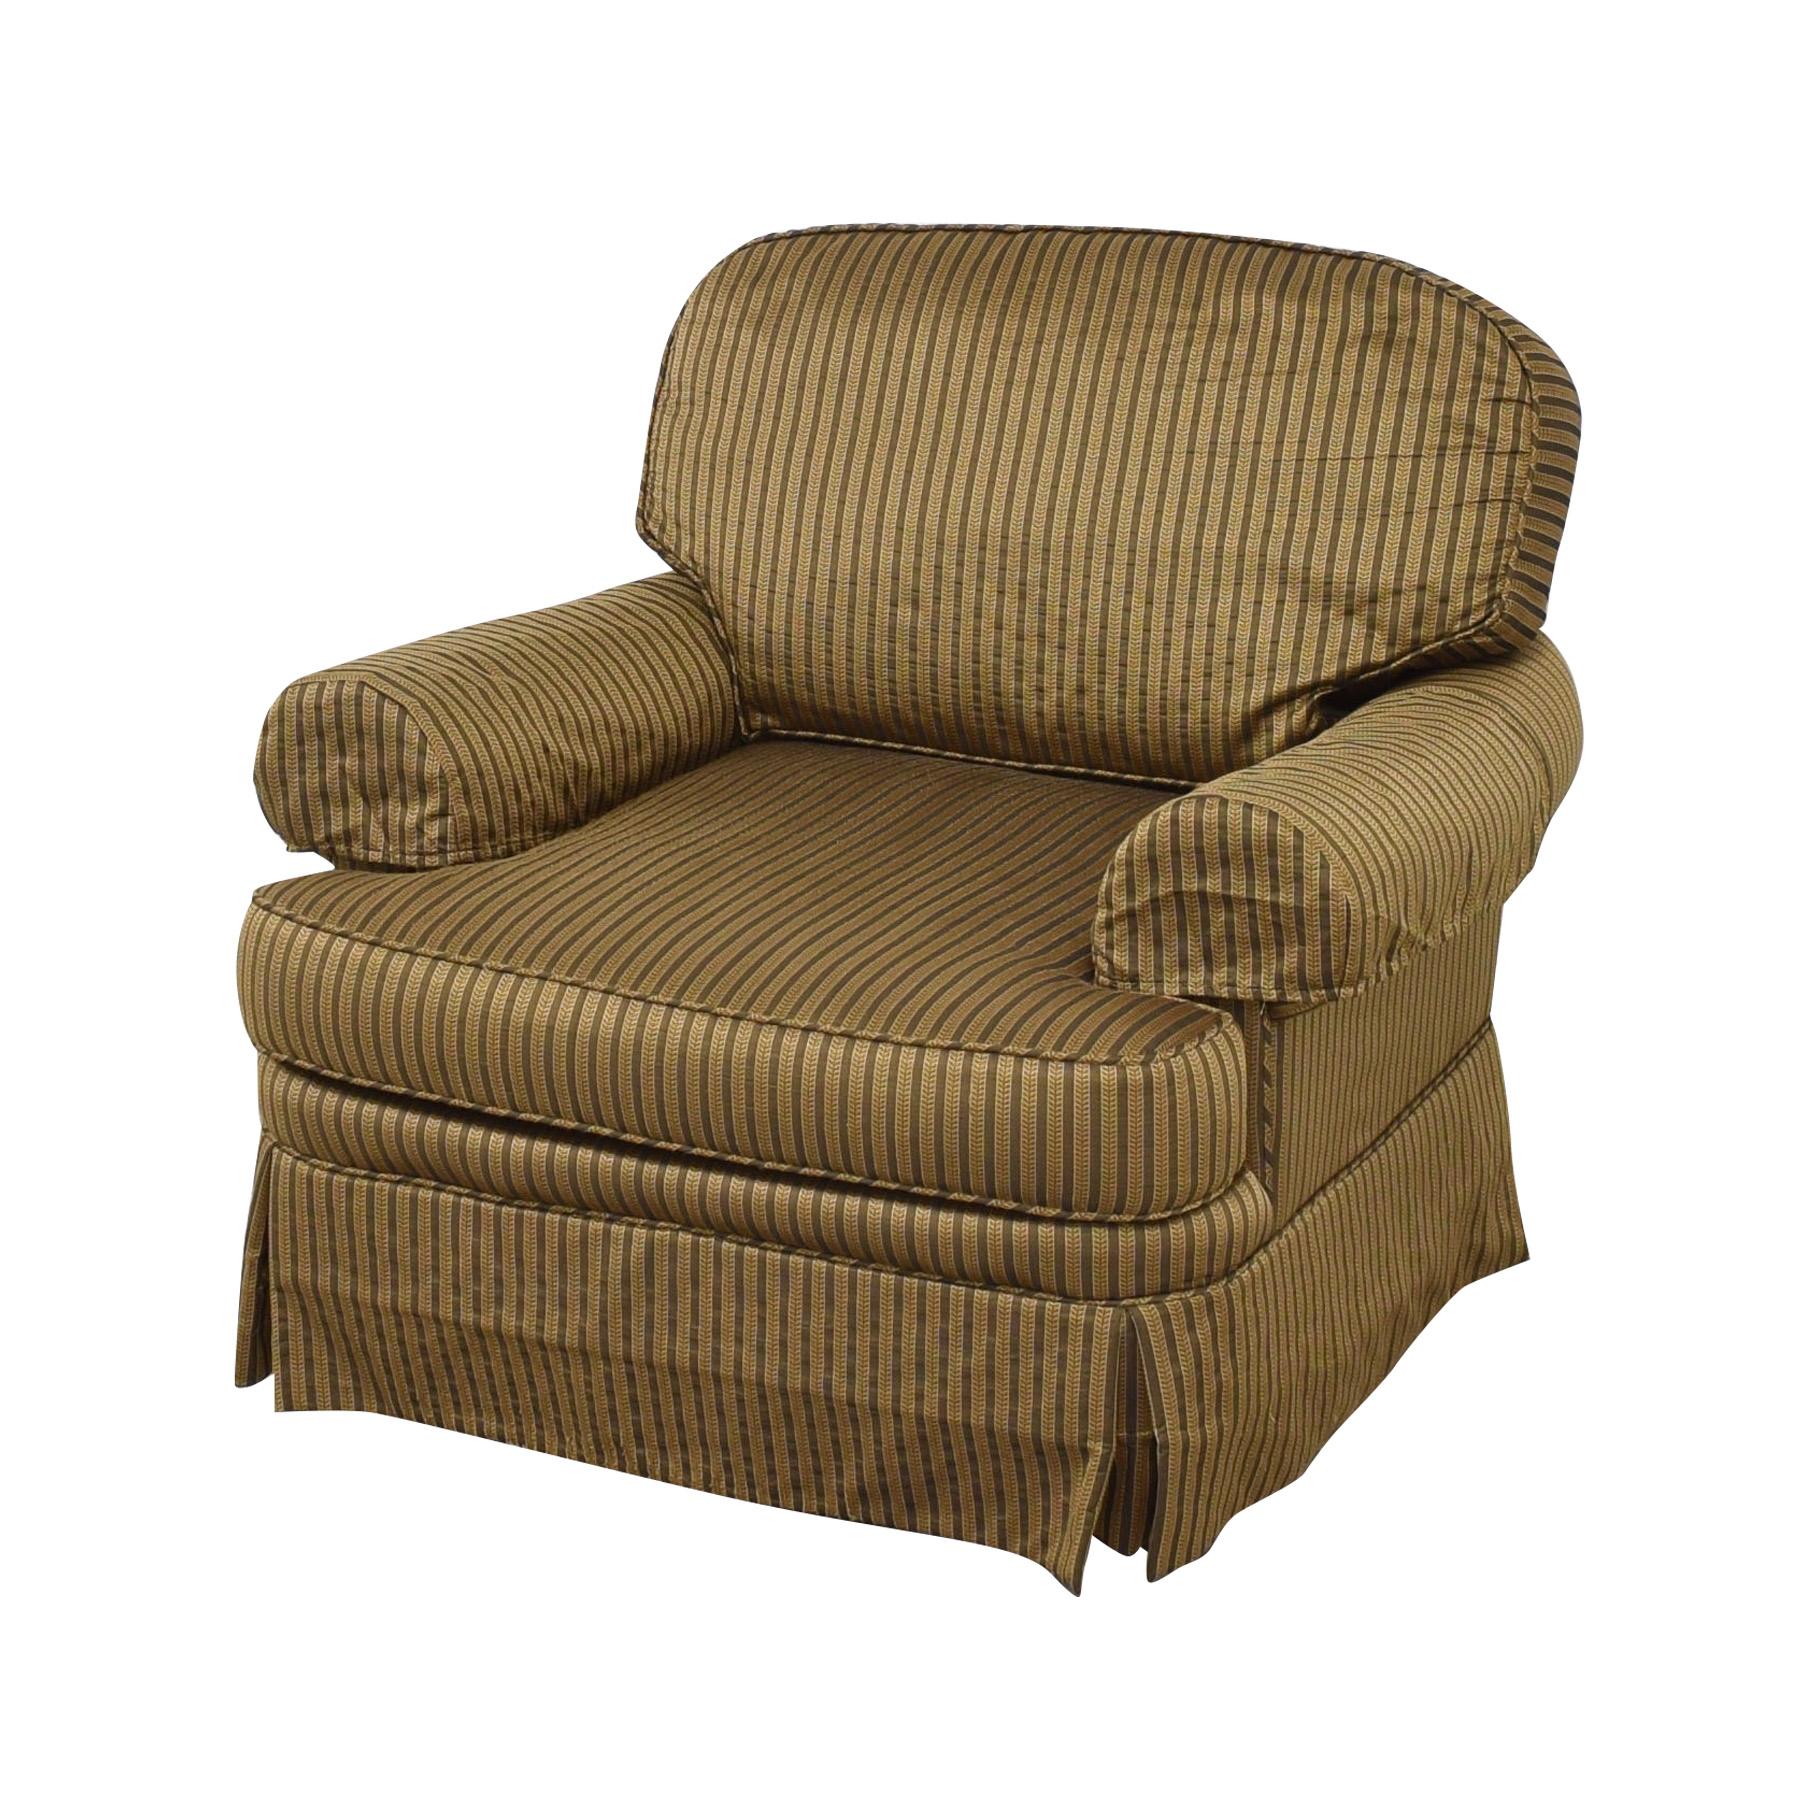 Woodmark Woodmark Swivel Chair pa